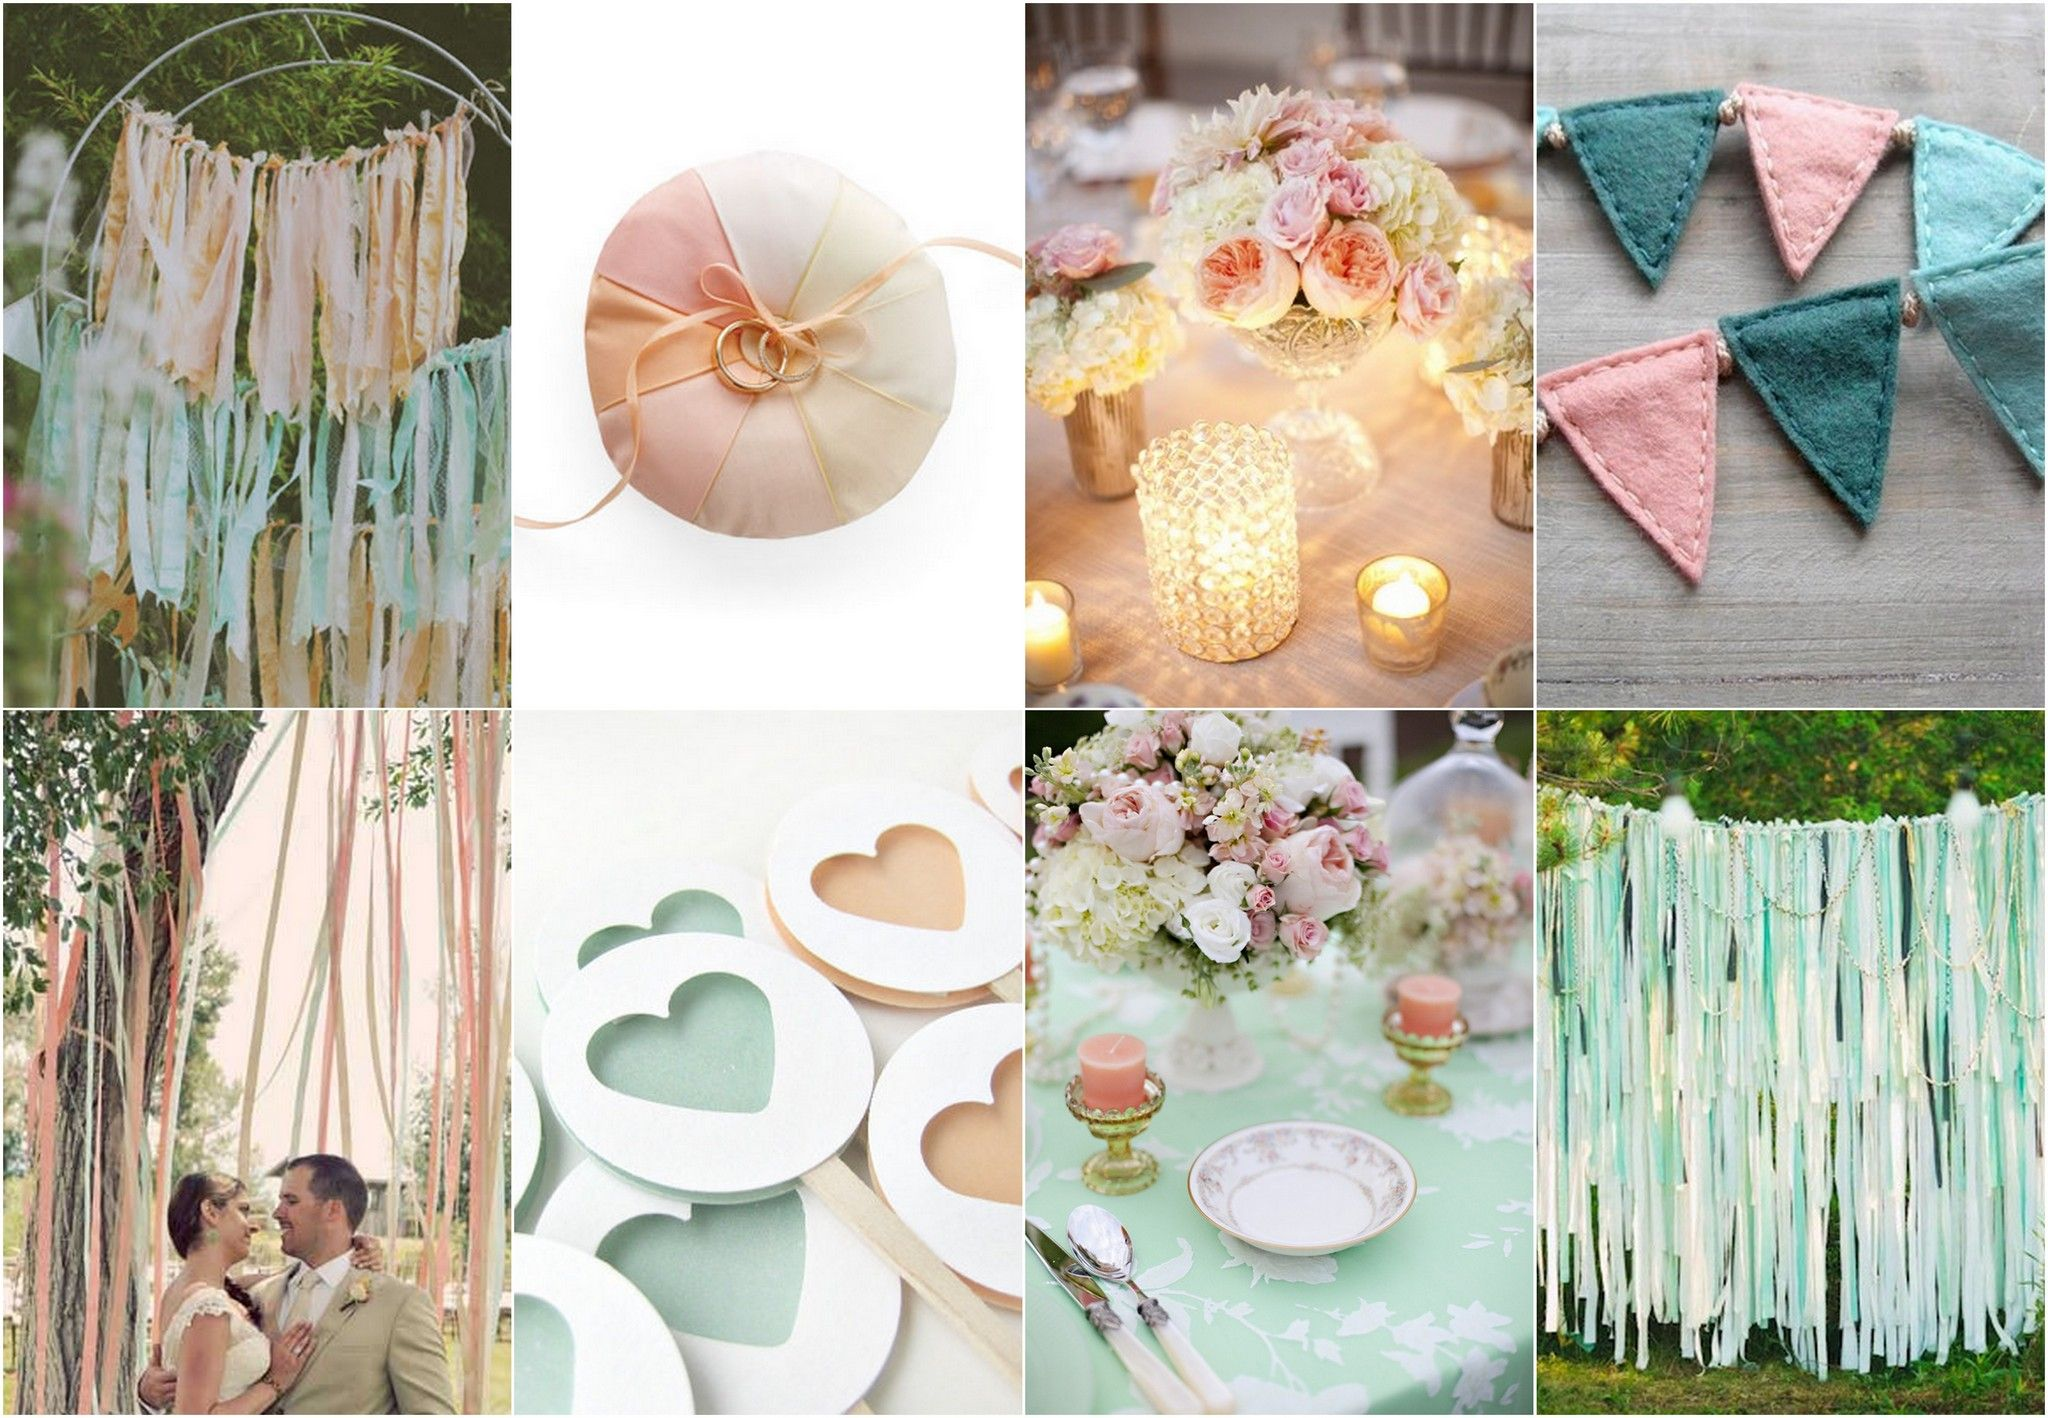 Mint Green And Peach Wedding Theme